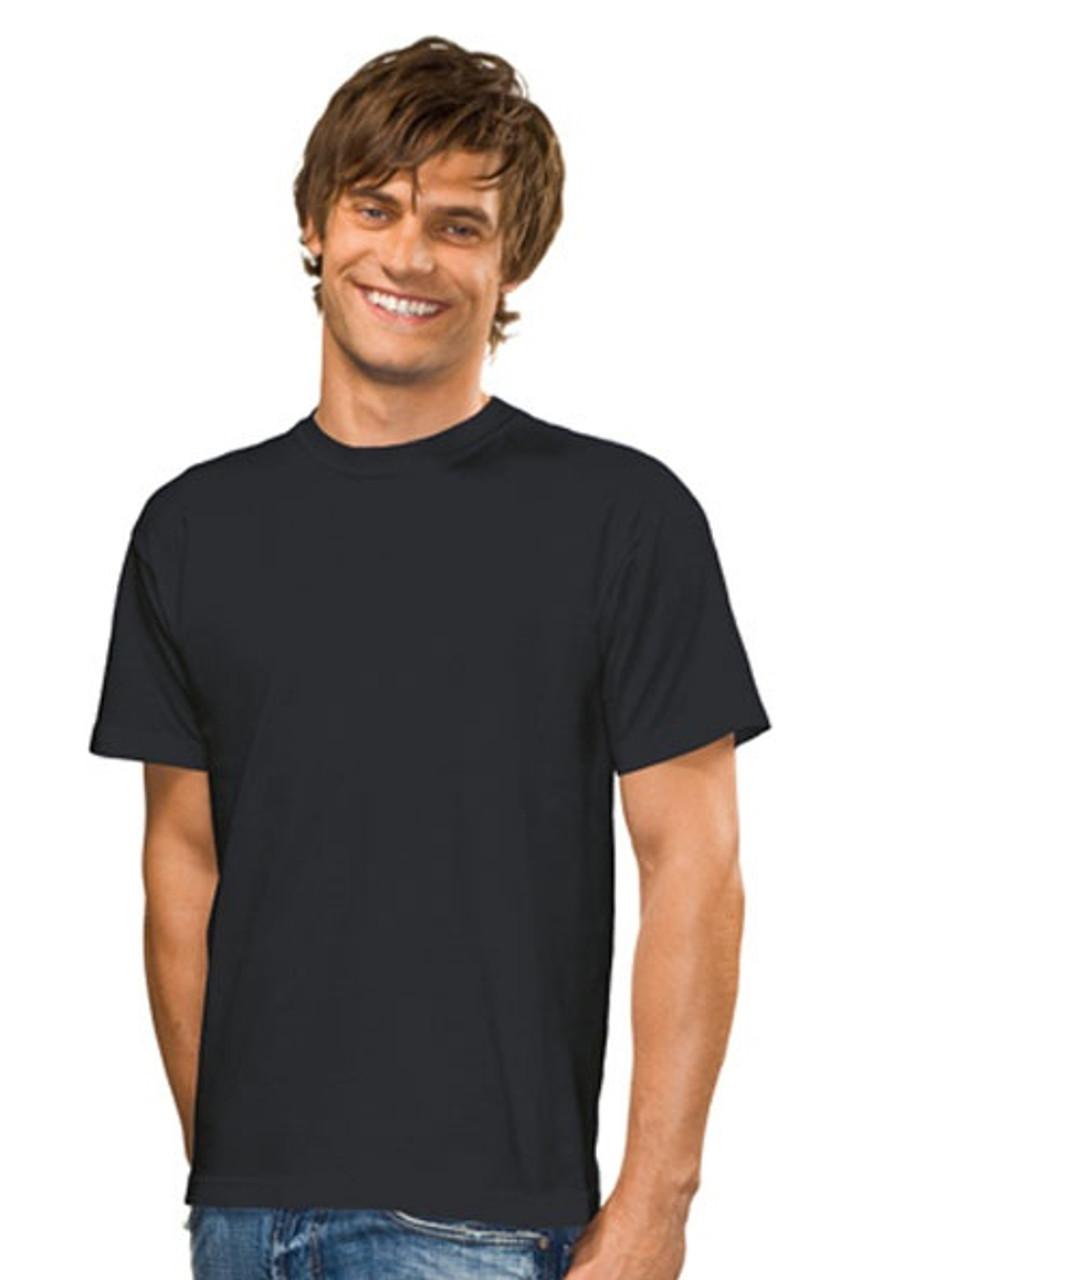 f61537bc BEEFY | t-shirts men | tubular eco | 100% cotton | Plain T Shirts | Wholesale  T Shirts